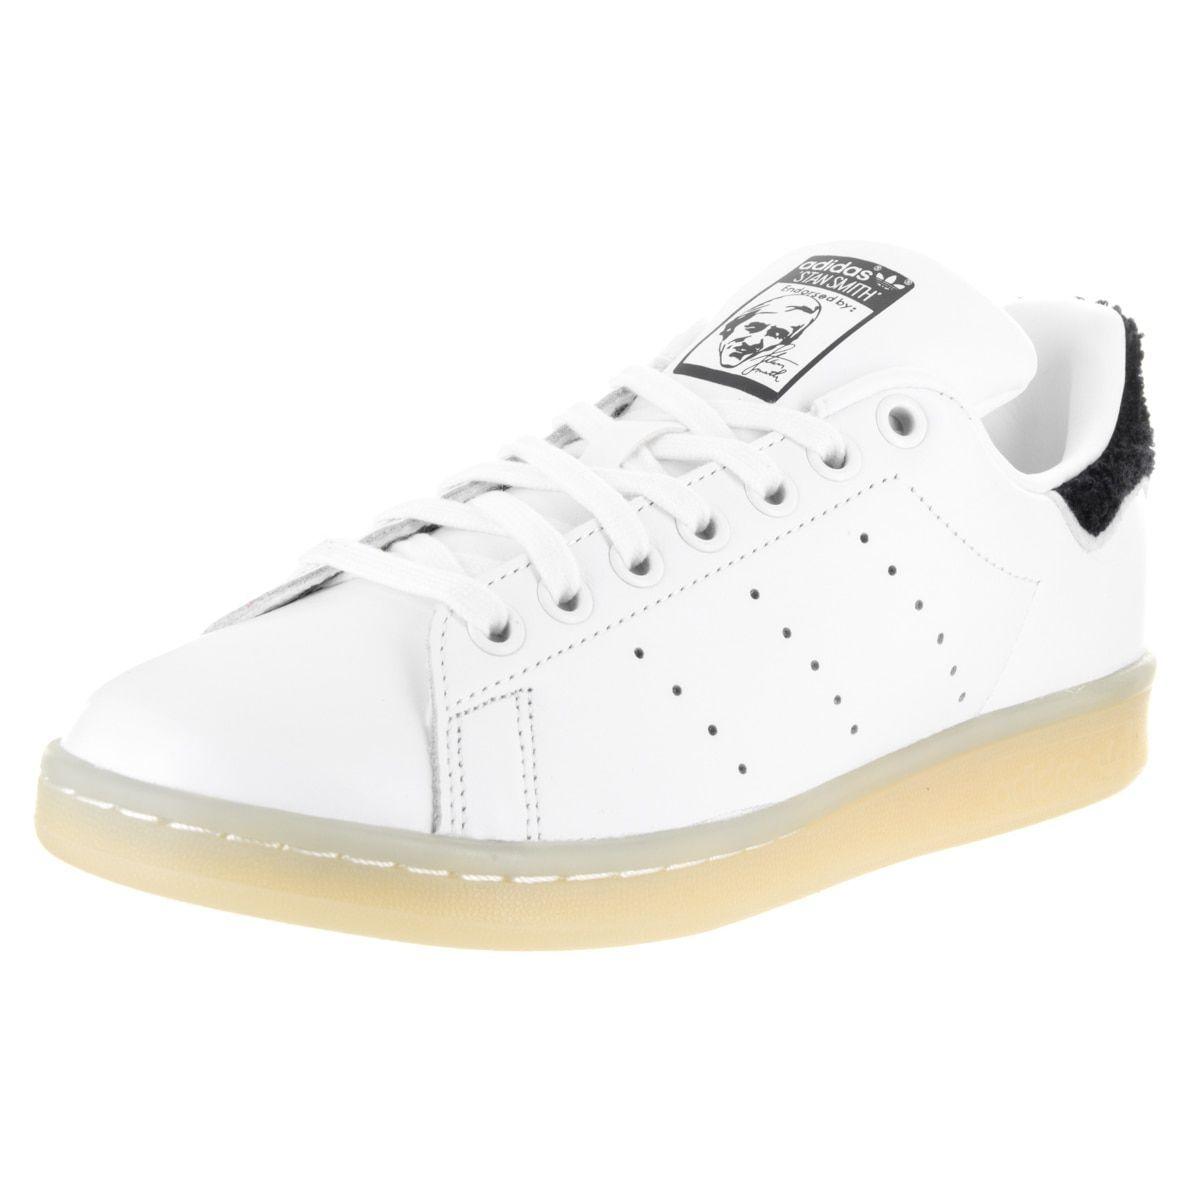 6703d2054b8 Adidas Women s Stan Smith W Originals White Leather Casual Shoe (7 ...